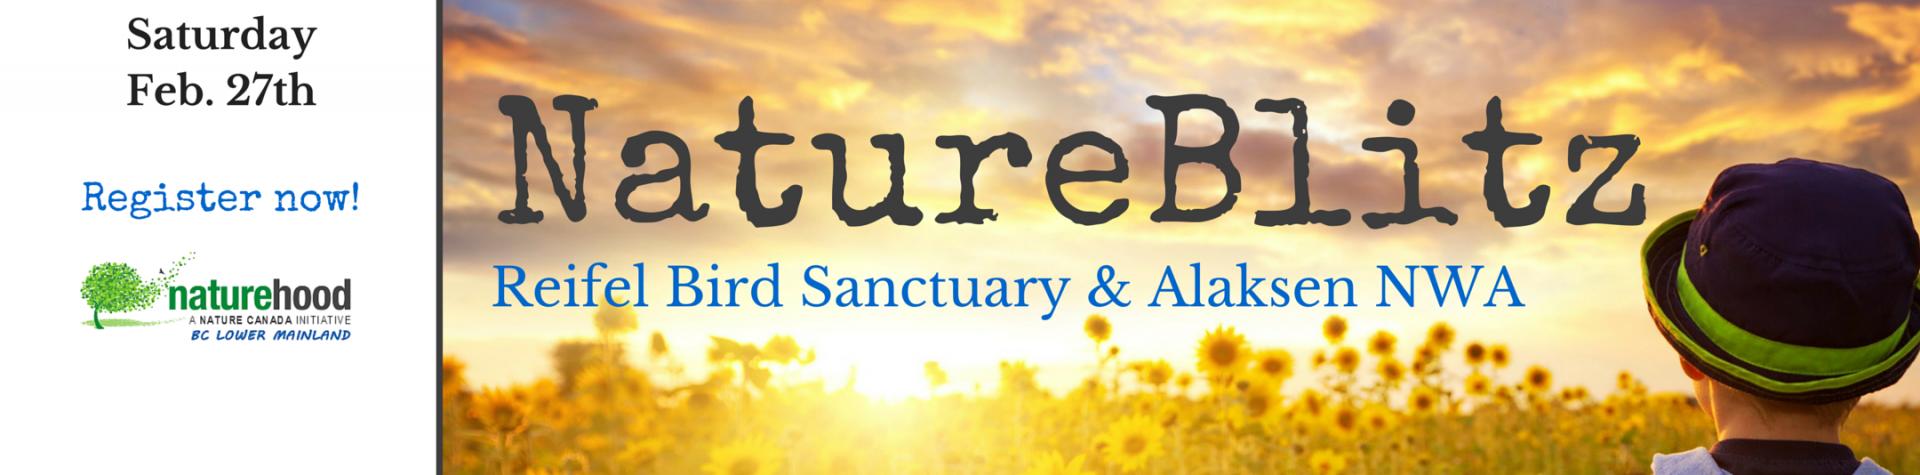 NatureHood Events - Lower Mainland NatureBlitz, February 27 2016